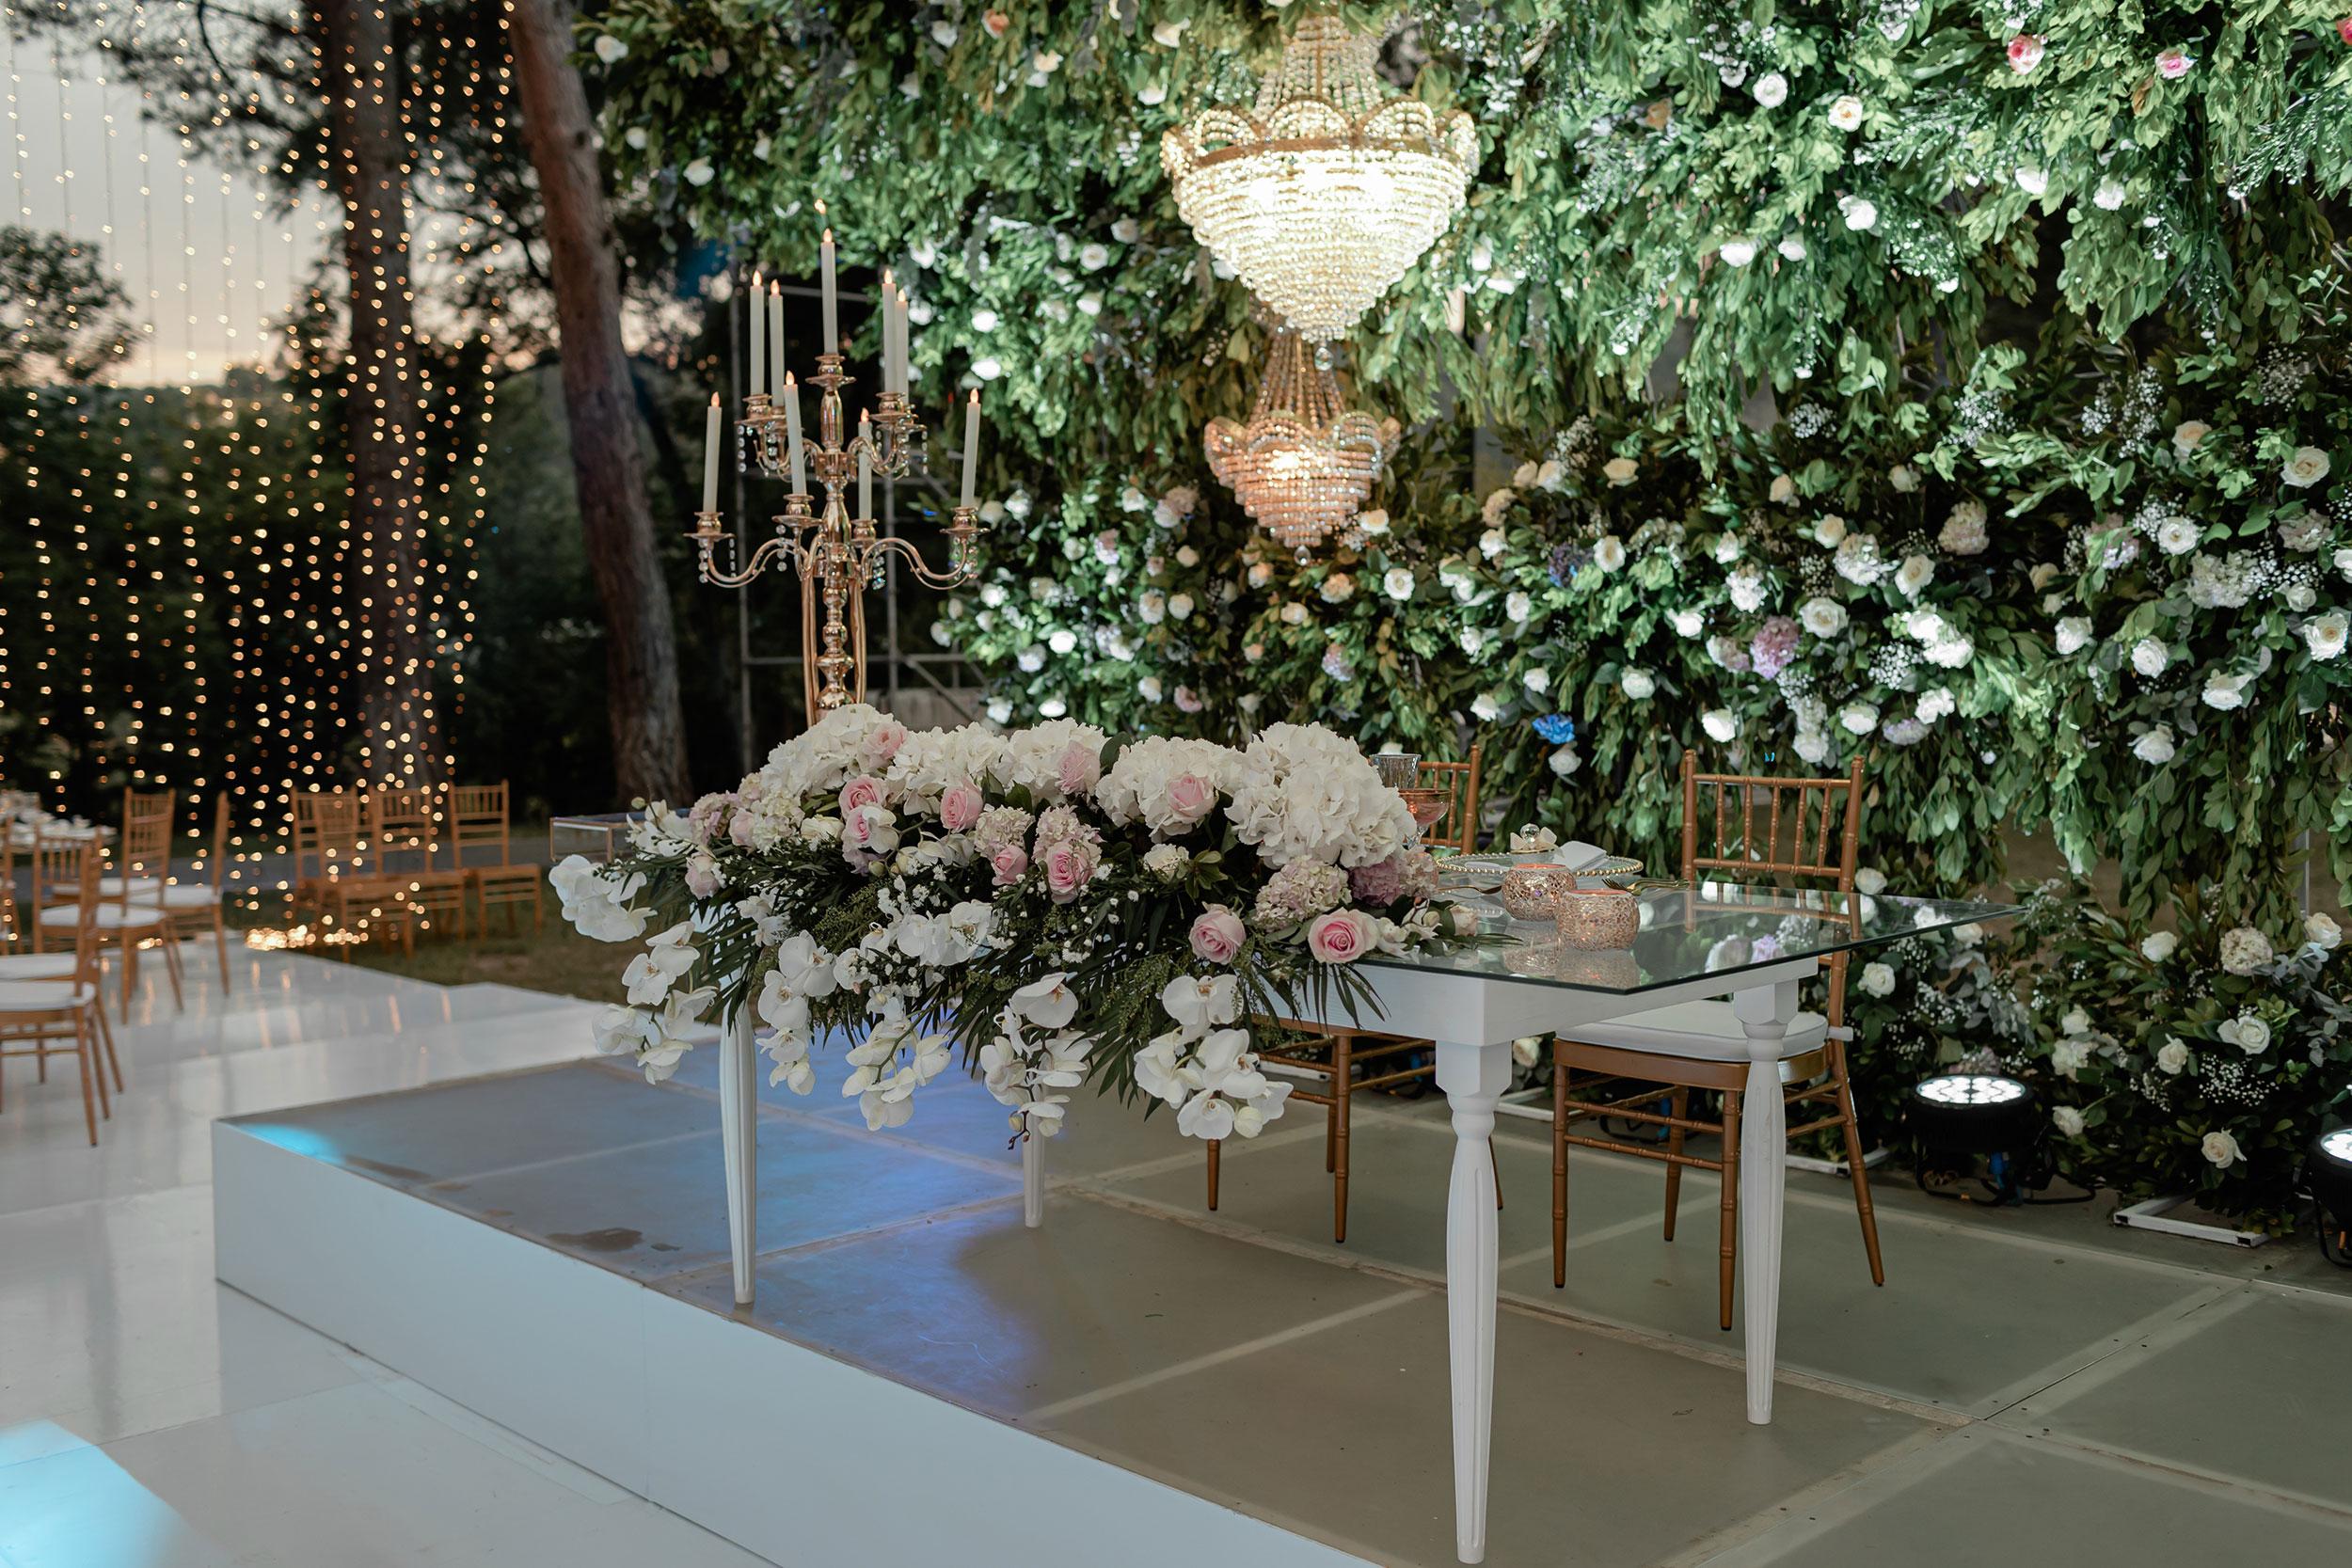 Romantic floral table decorations